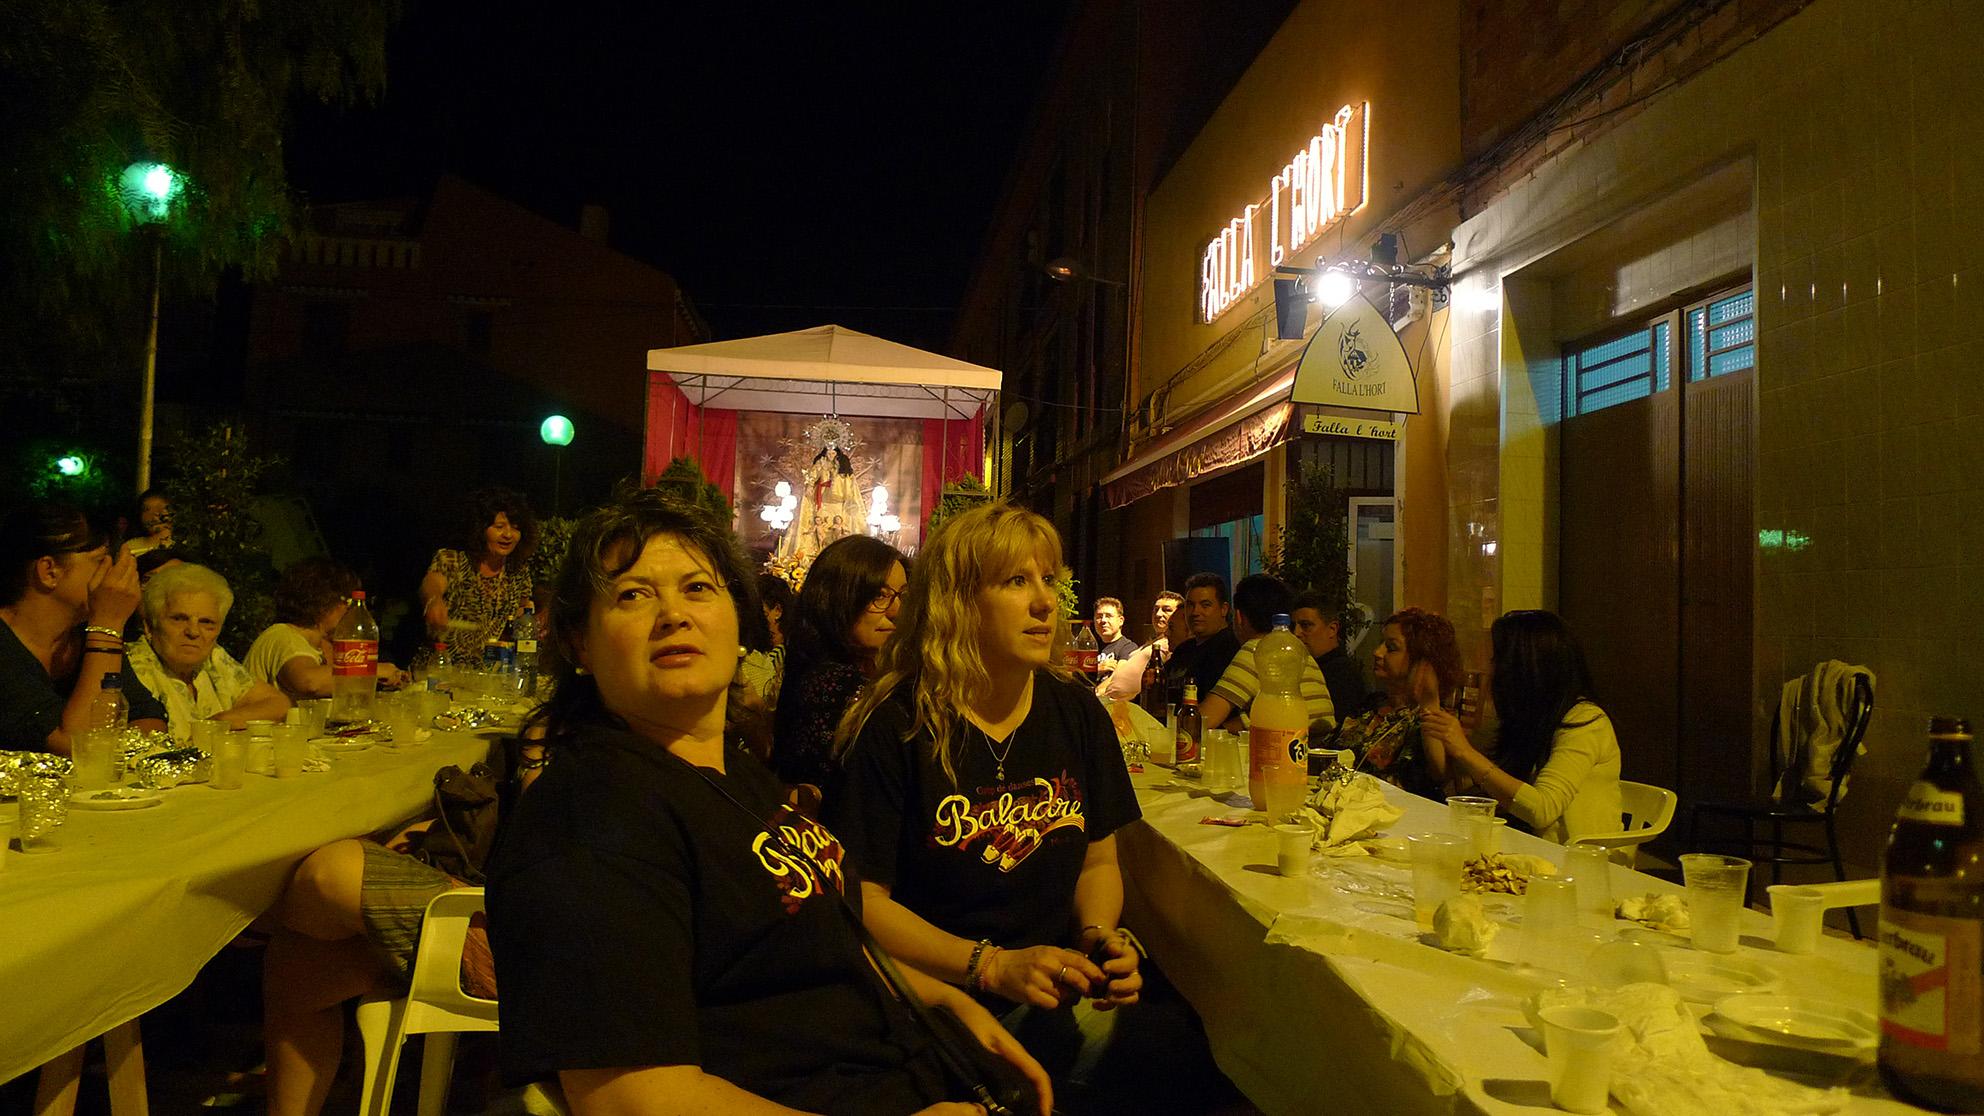 2014-06-07-Albaes d'Albal-Desemparats07 (14)